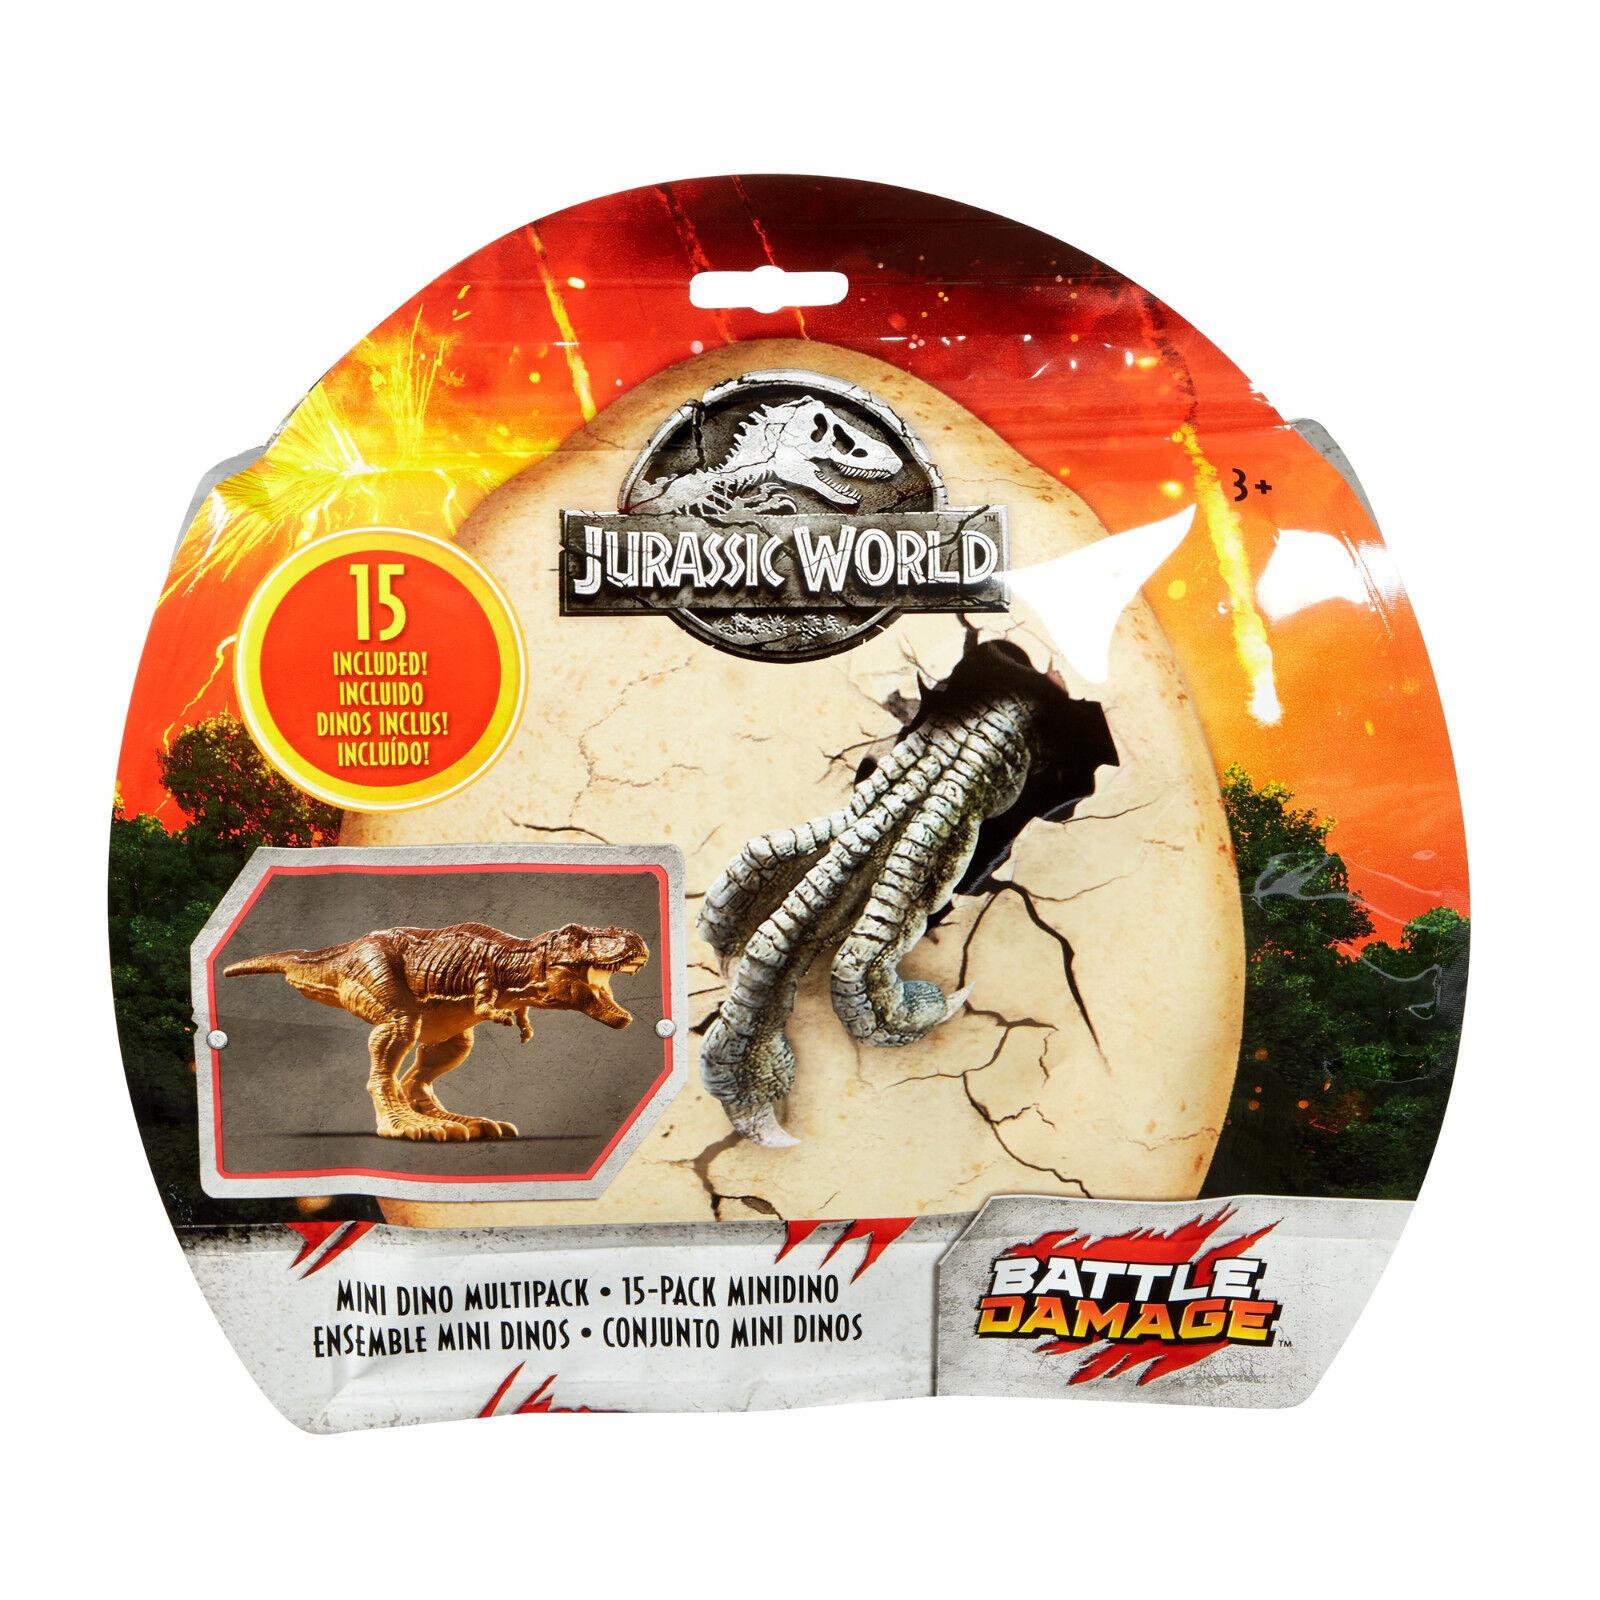 Jurassic World 2 MINI DINO borsa MULTIPACK 15 SET battaglia DAMAGE EXCLUSIVE DINOSAUR